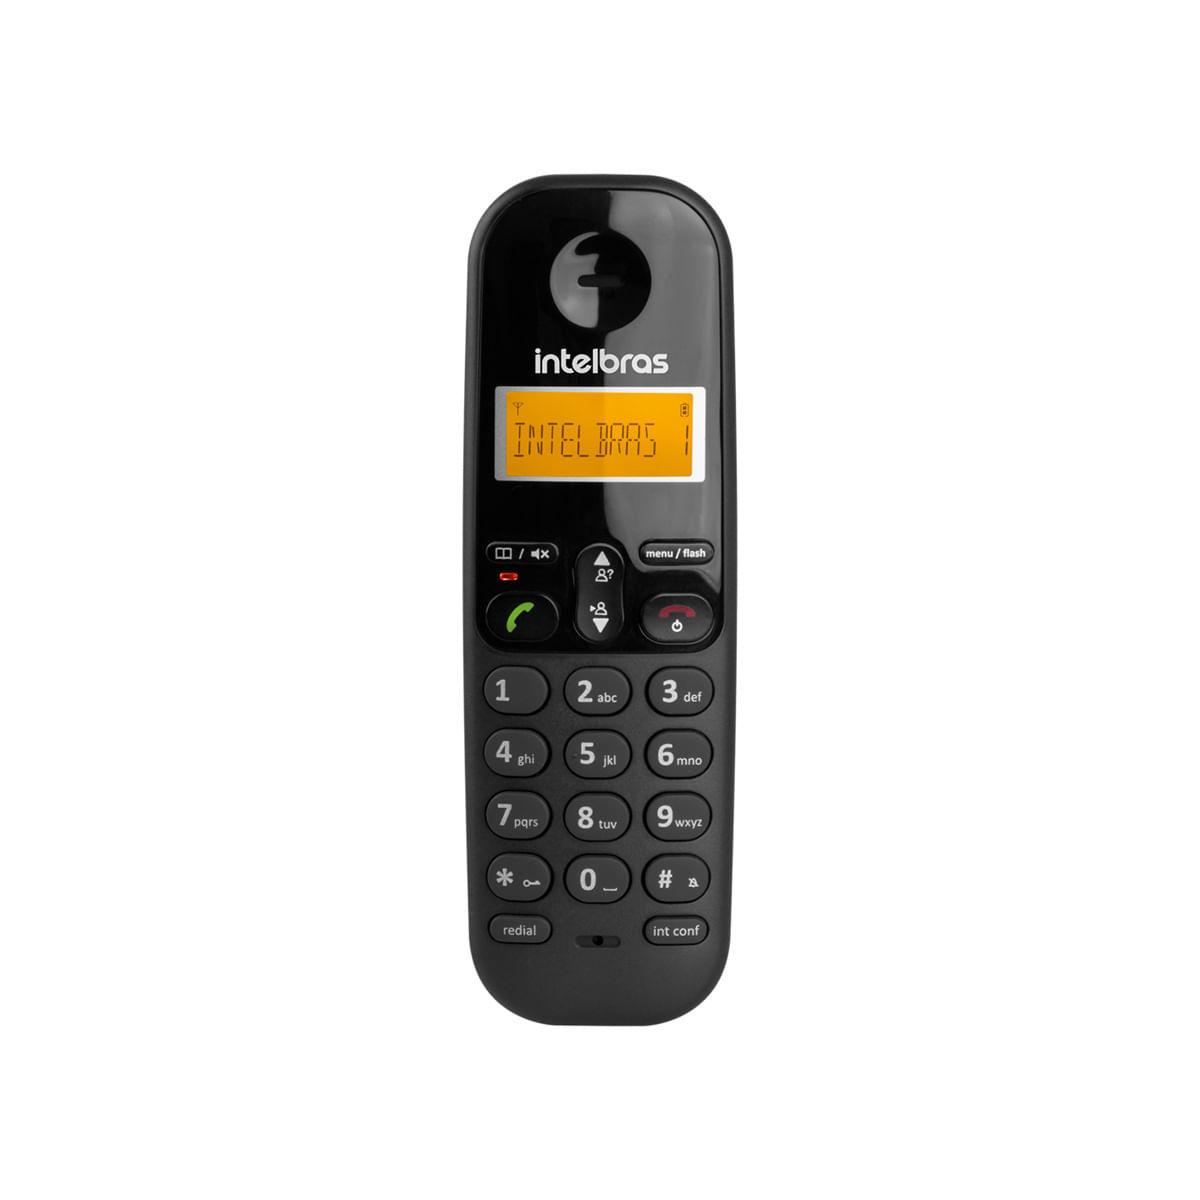 Ramal sem Fio Digital Intelbras TS 3111 Preto